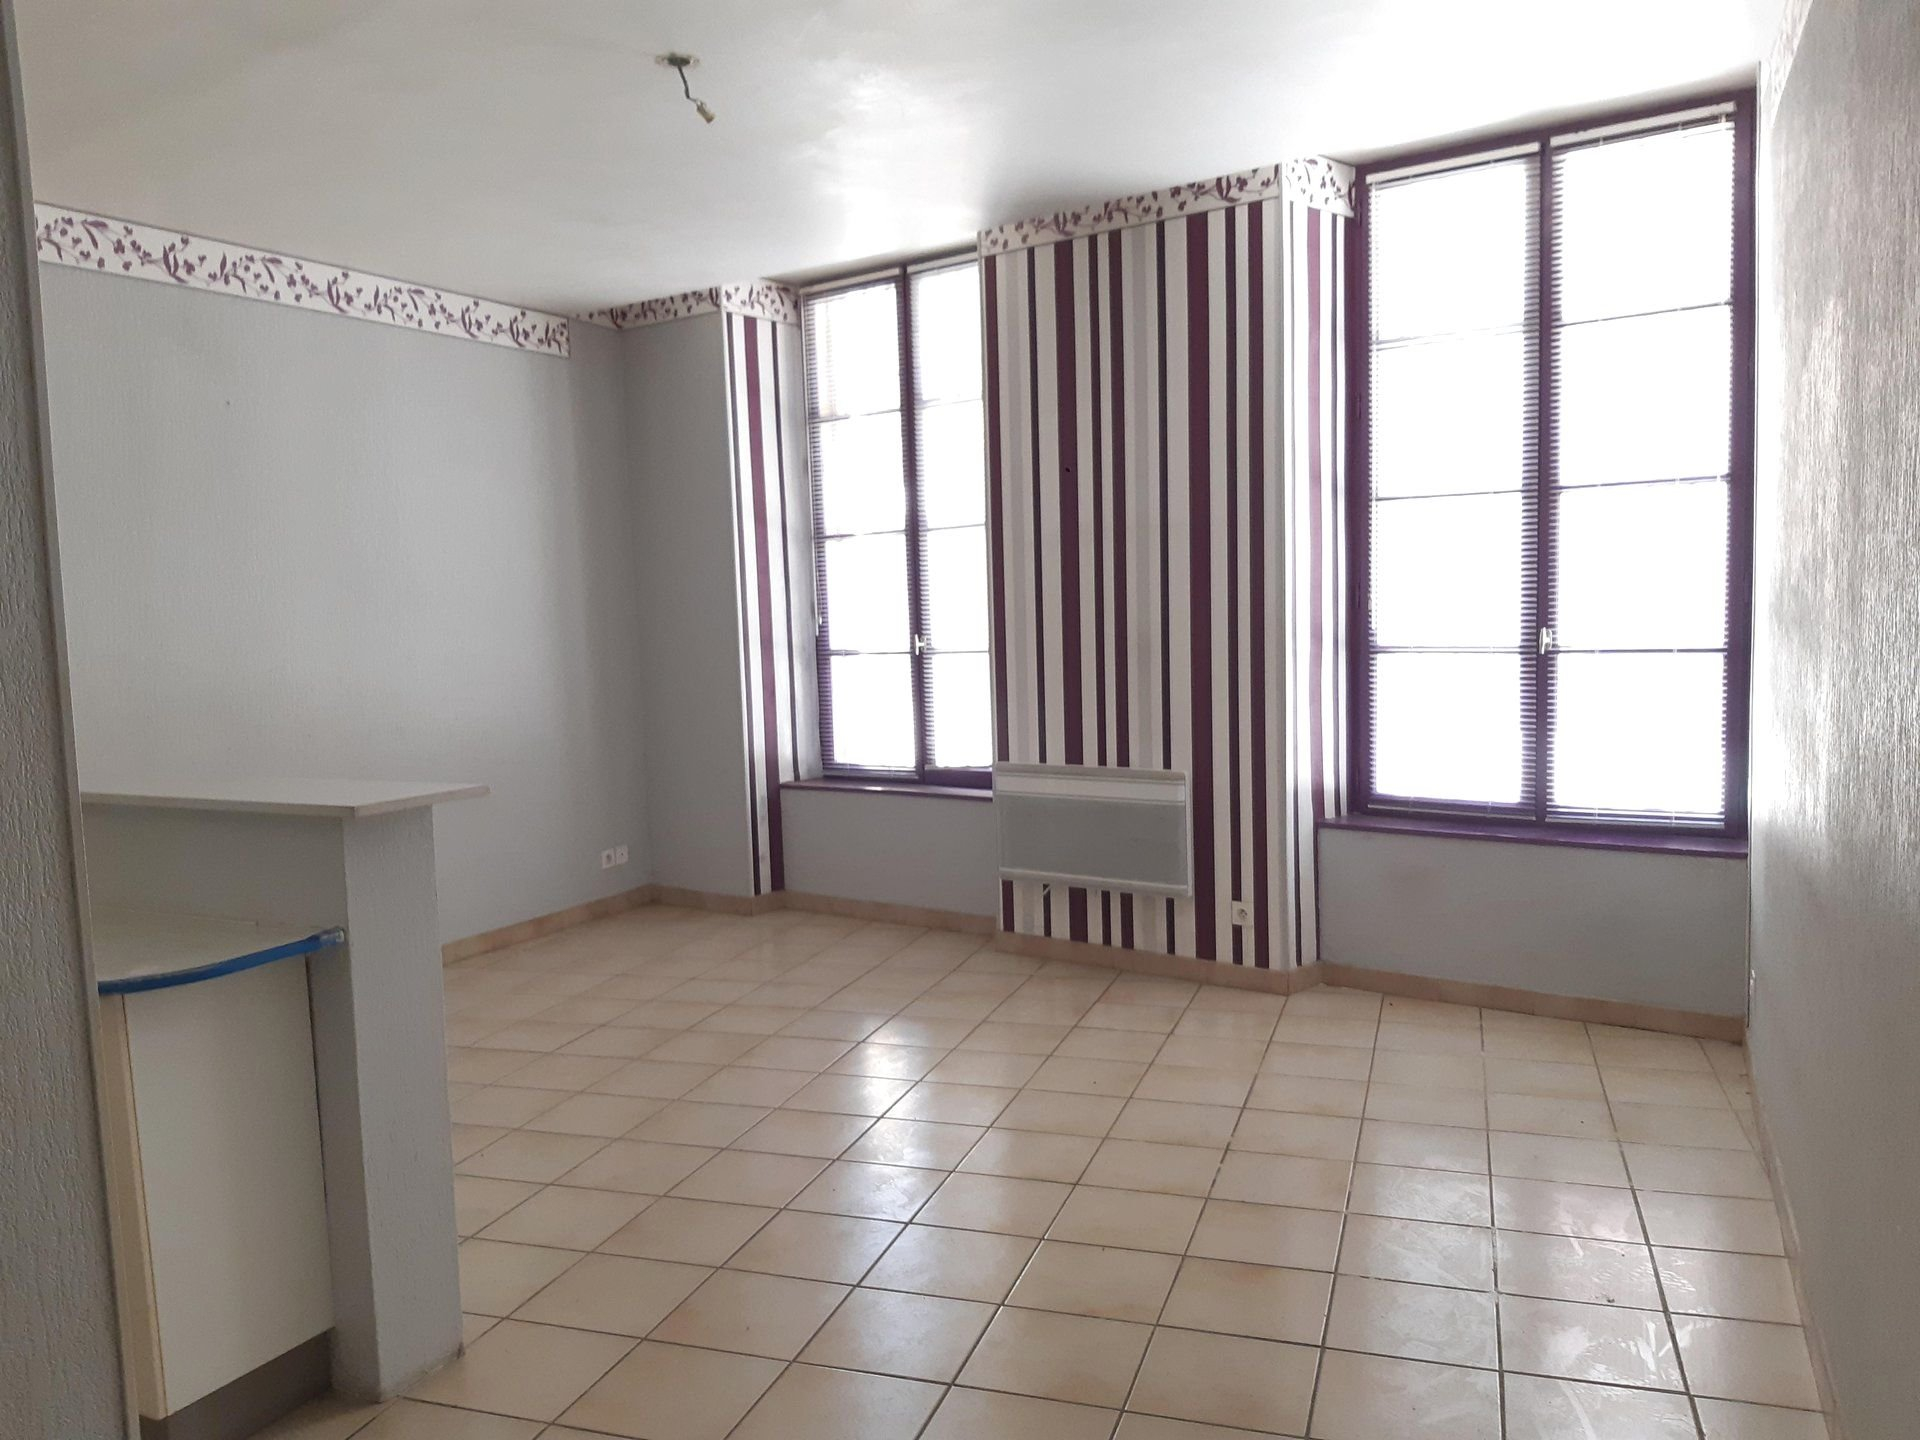 Location Appartement TARASCON 1 chambres